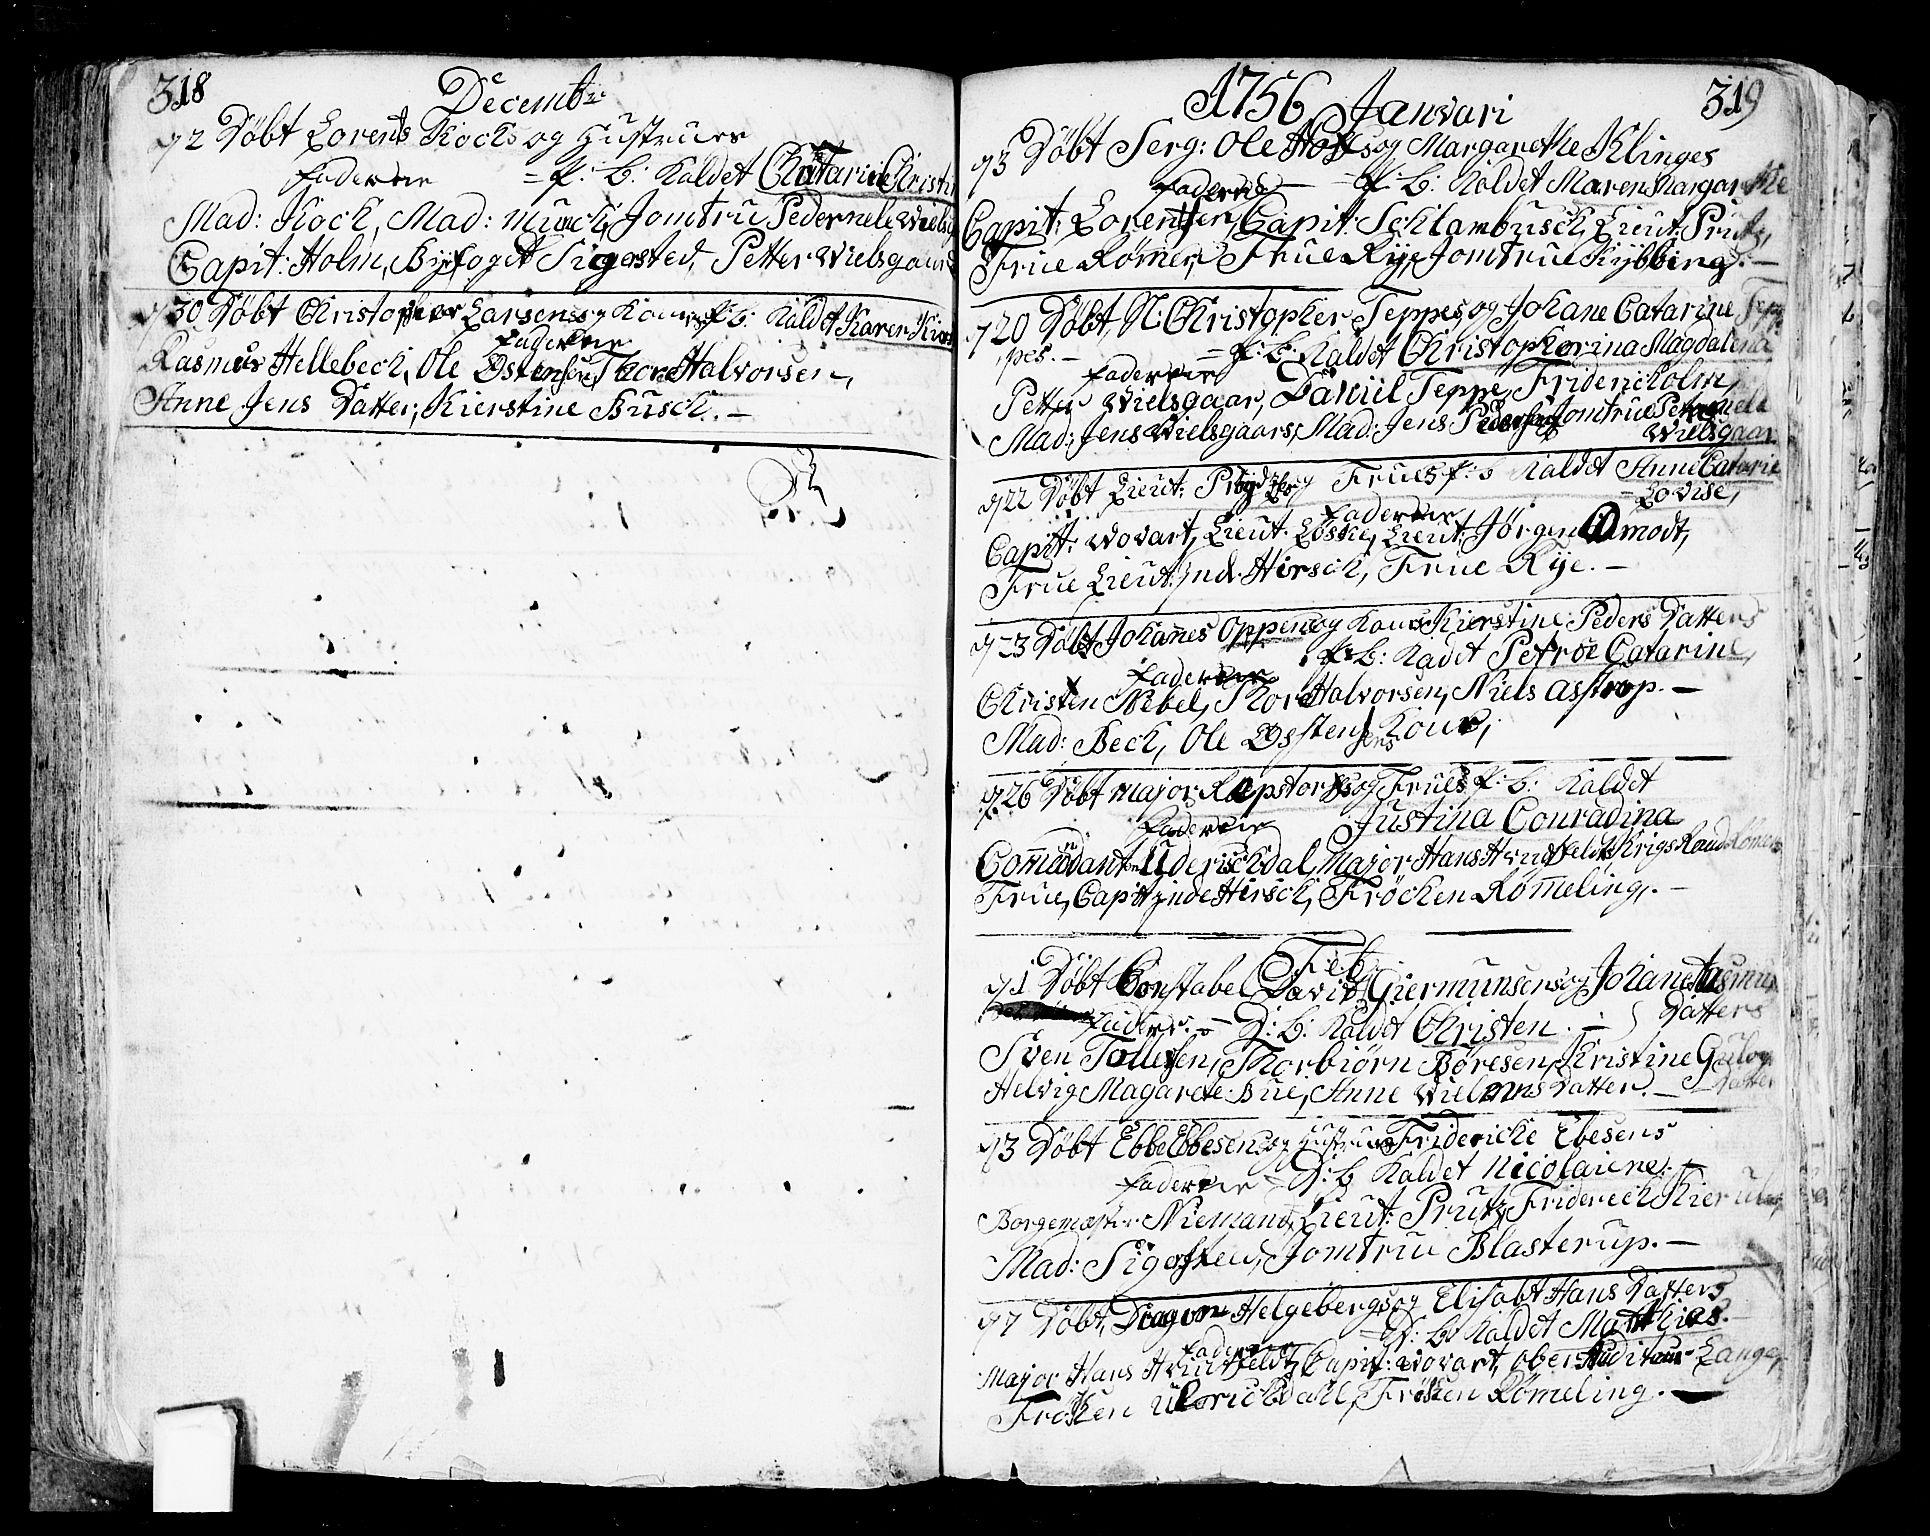 SAO, Fredrikstad prestekontor Kirkebøker, F/Fa/L0002: Ministerialbok nr. 2, 1750-1804, s. 318-319